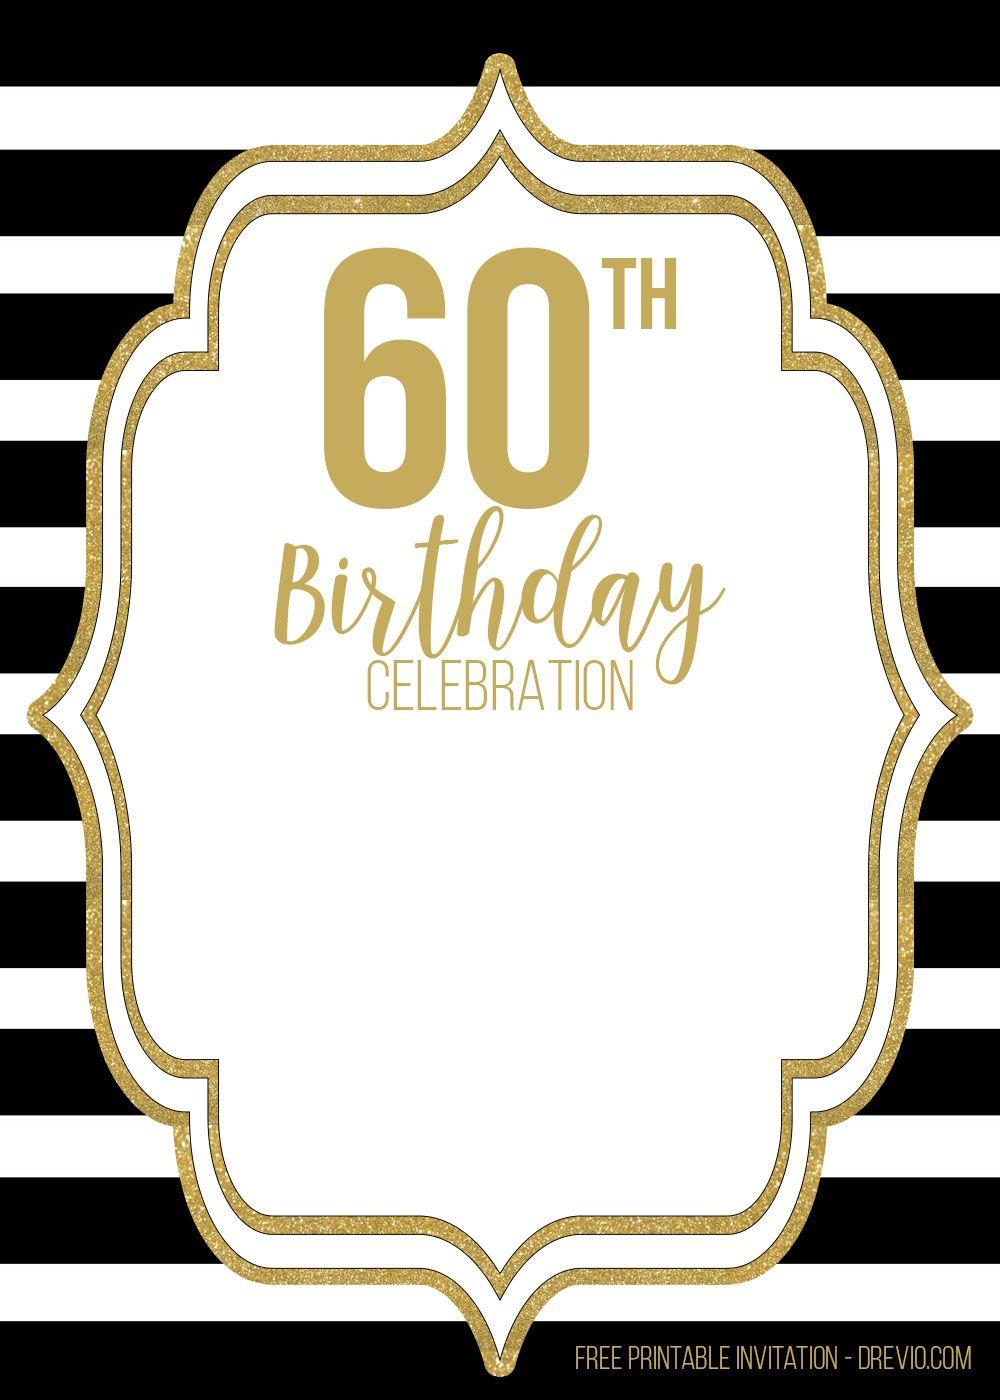 Free Printable Black And Gold 60th Birthday Invitation Templates 60th Birthday Party Invitations 60th Birthday Invitations Party Invite Template